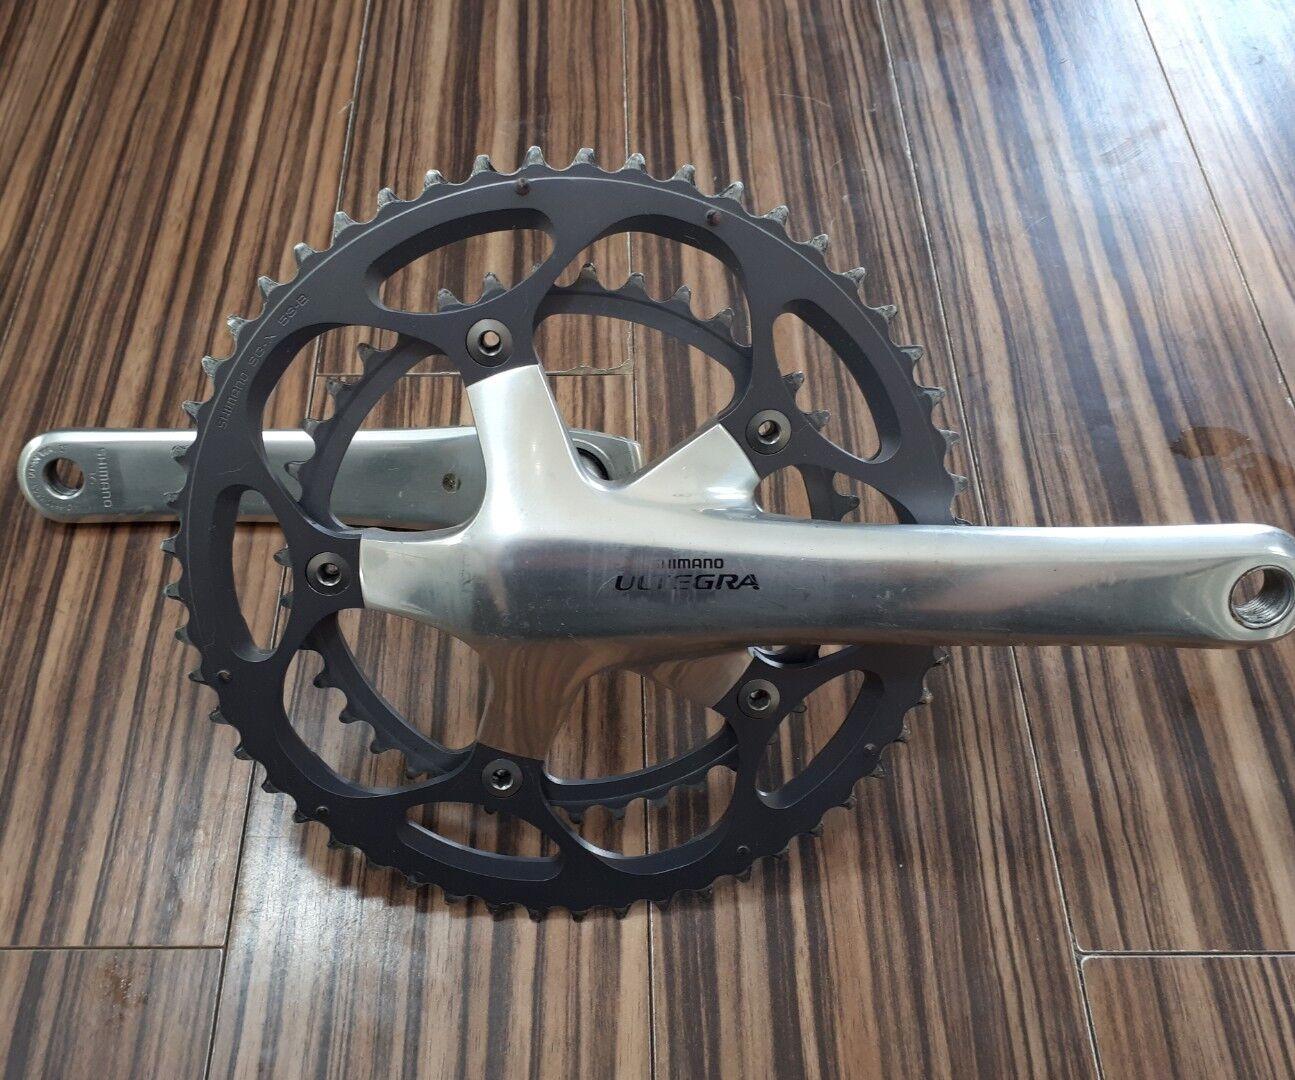 SHIuomoO ULTEGRA pedaliera in 5339 175mm uomoovelle 6600 argentoo argentoo argentoo 10 Velocità Strada Bicicletta CX TT 47d